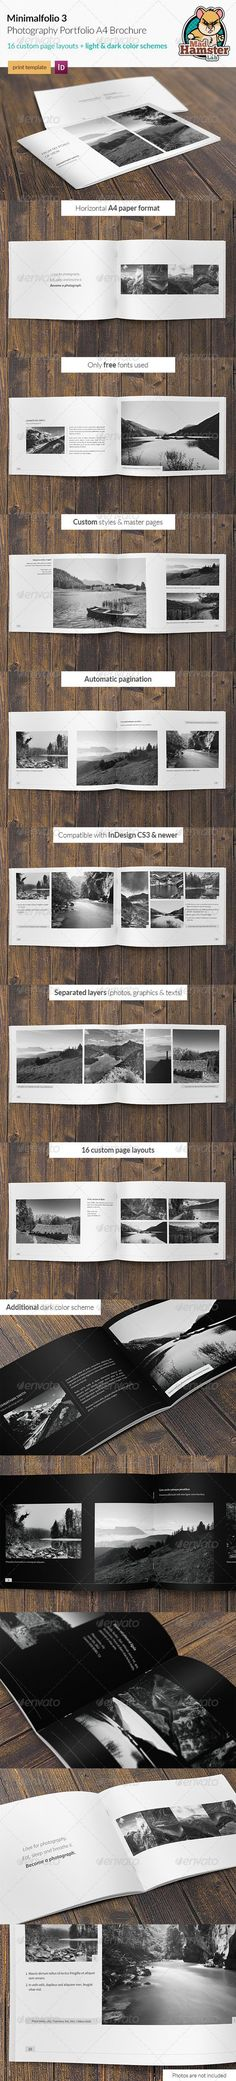 Minimalfolio 3 Photography Portfolio A4 Brochure - Portfolio Brochures: